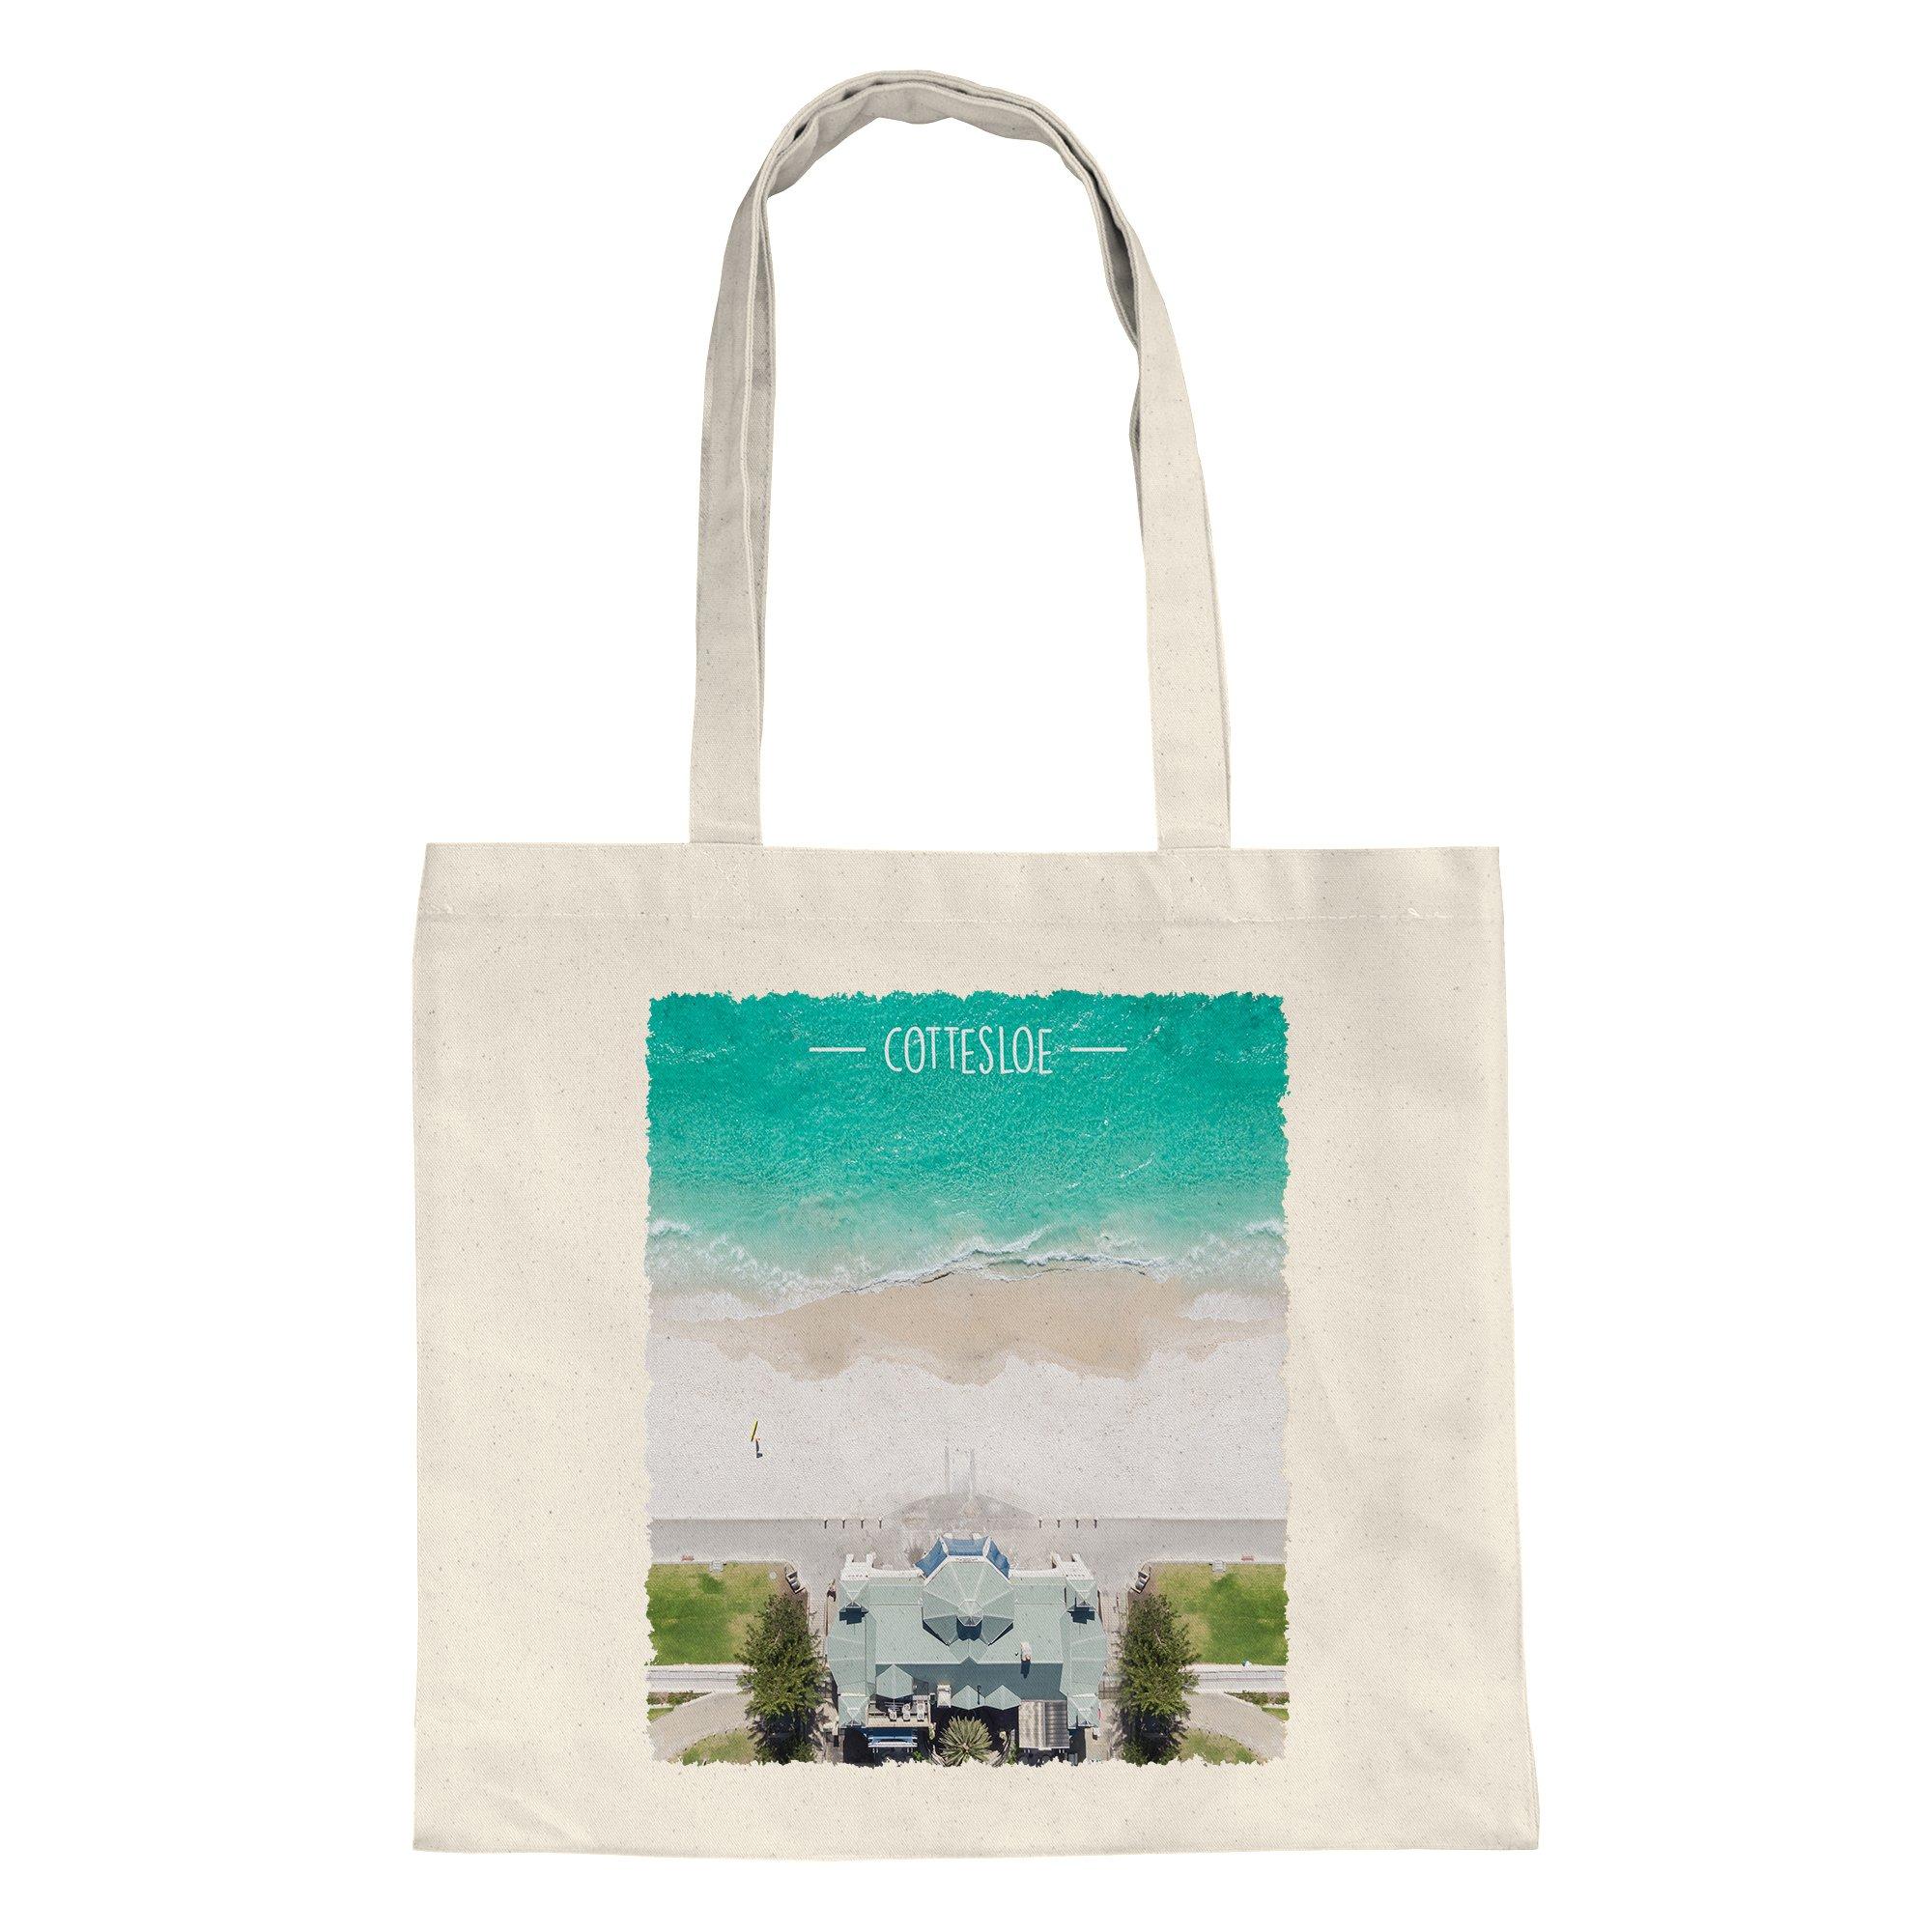 tote-shopping-bag-cottesloe-beach-perth_1024x1024@2x (1)